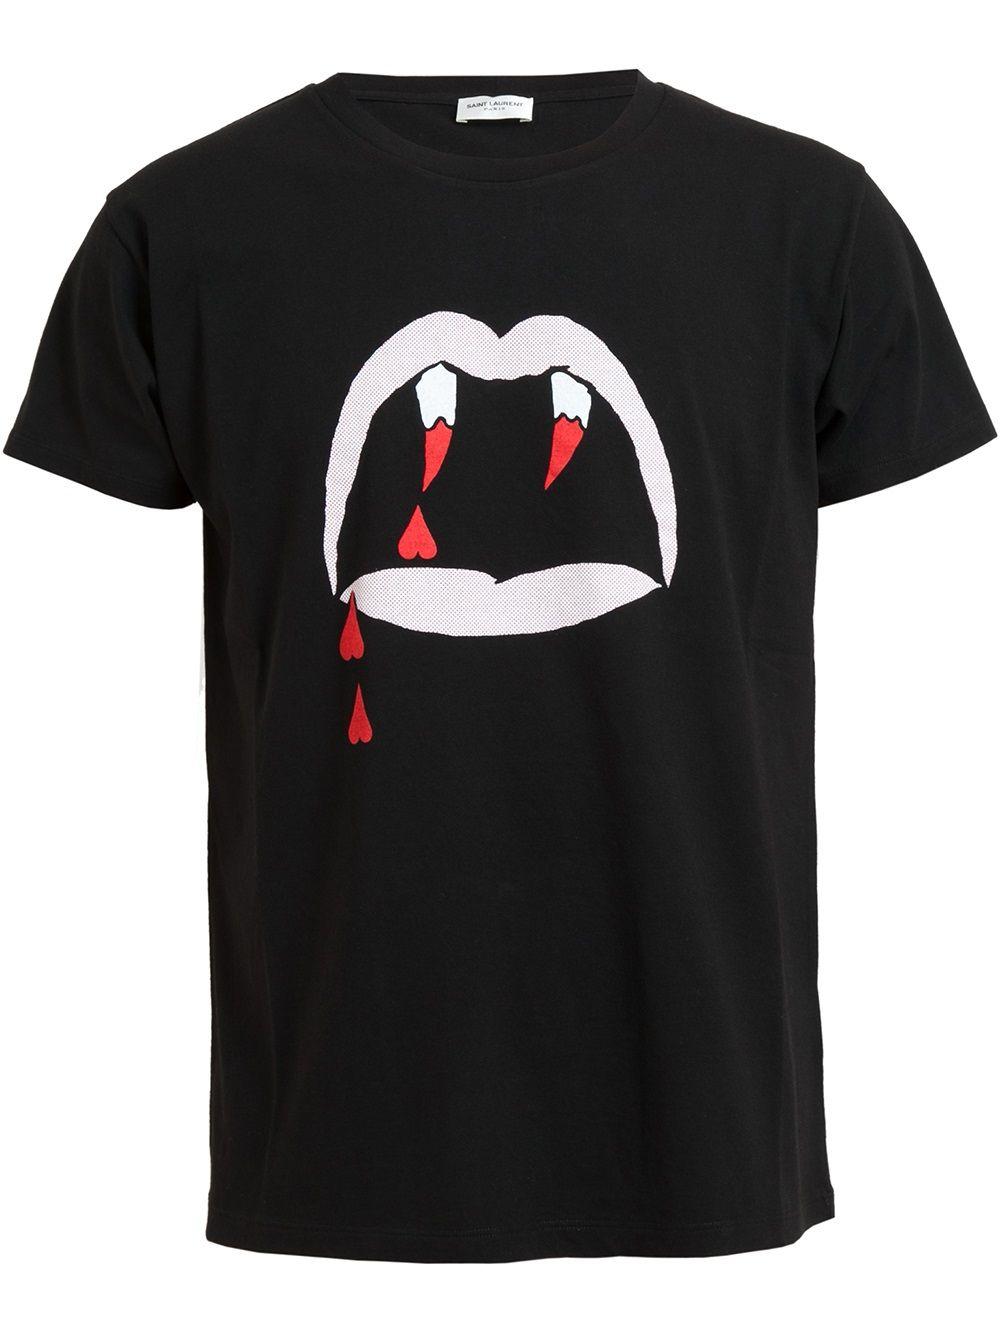 6fa2665013 Saint laurent Vampire Lips Printed Cotton Tshirt in Red for Men ...